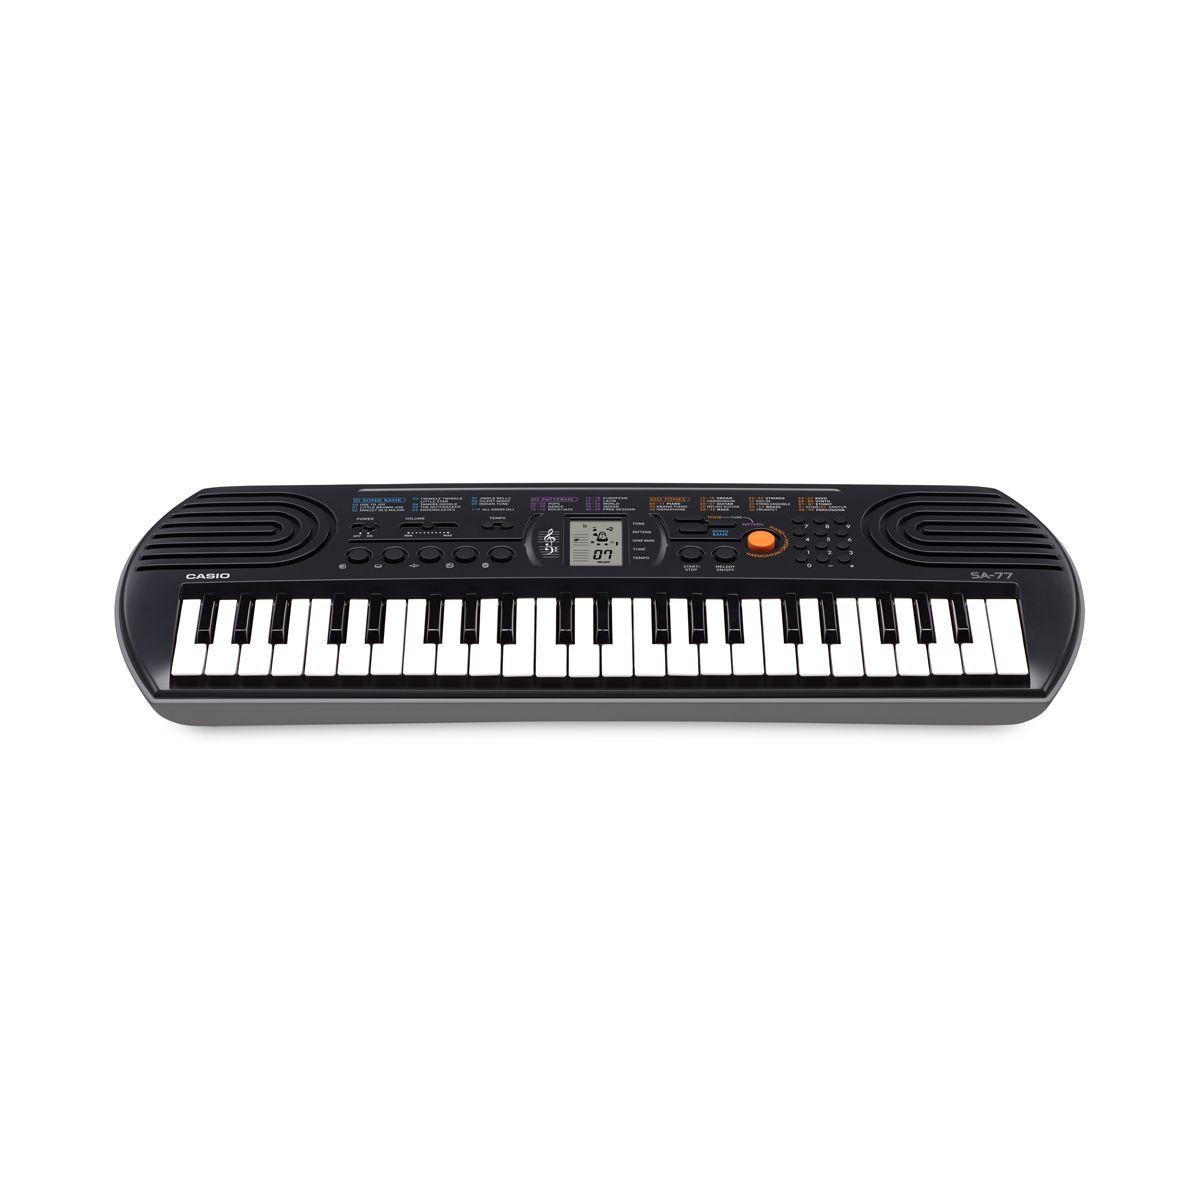 Tastiera Arranger Casio SA77 (base grigia) 44 tasti mini